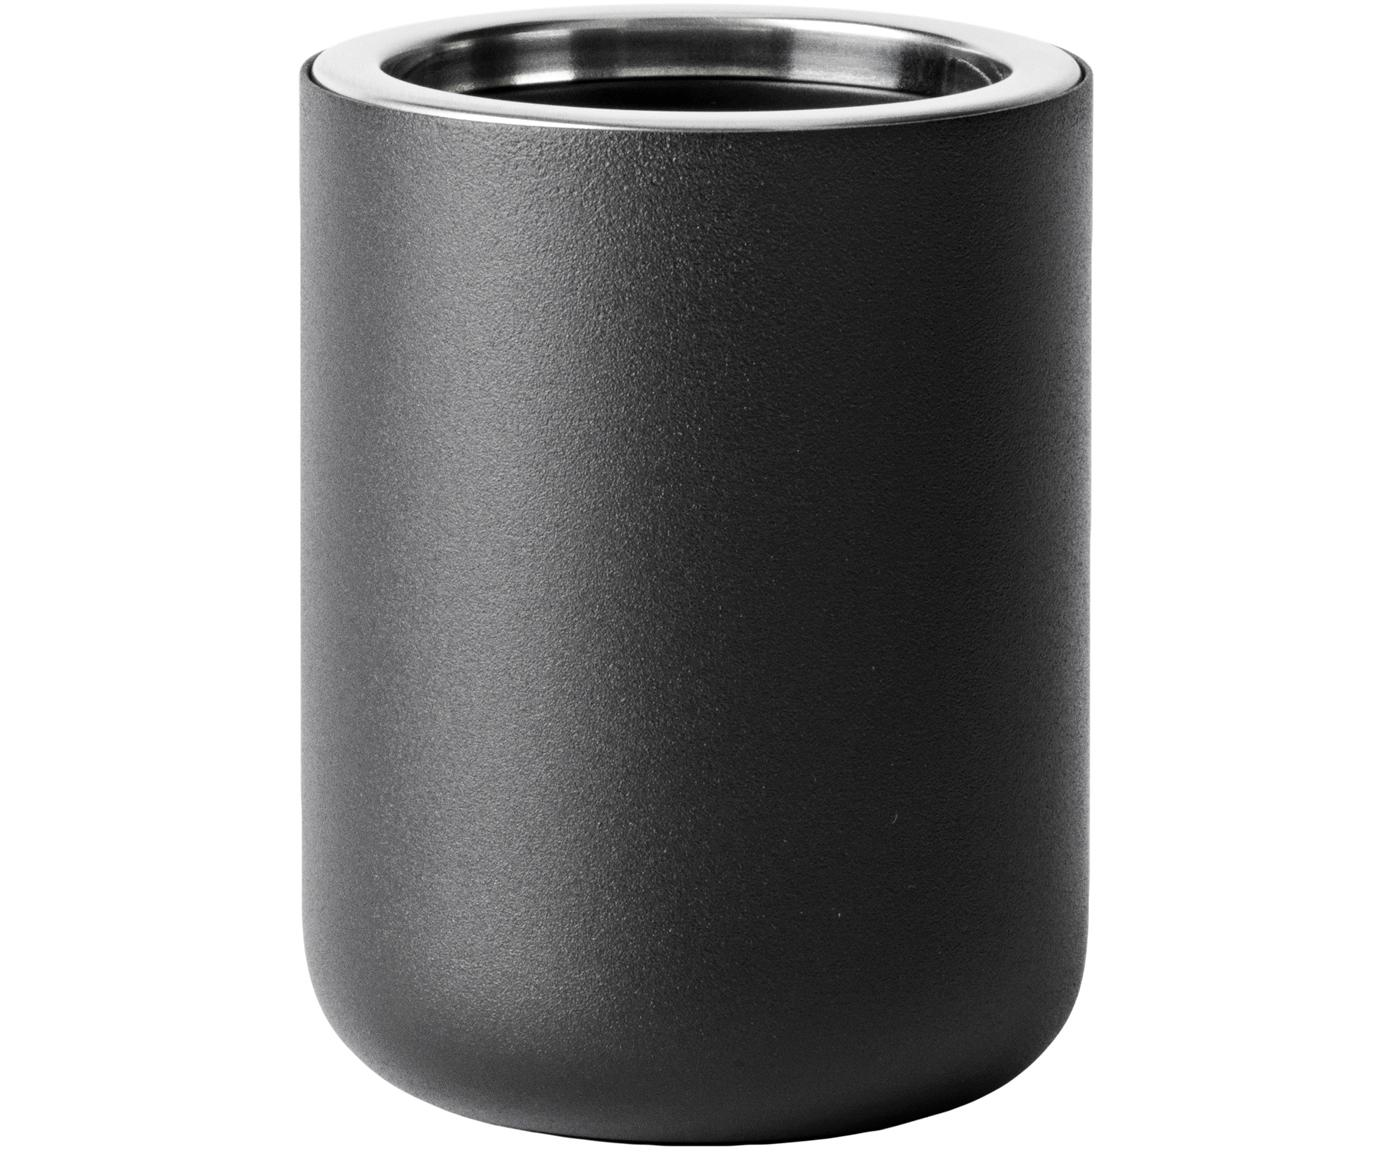 Zahnputzbecher Matty, Metall, Kunststoff, Schwarz, Ø 9 x H 11 cm